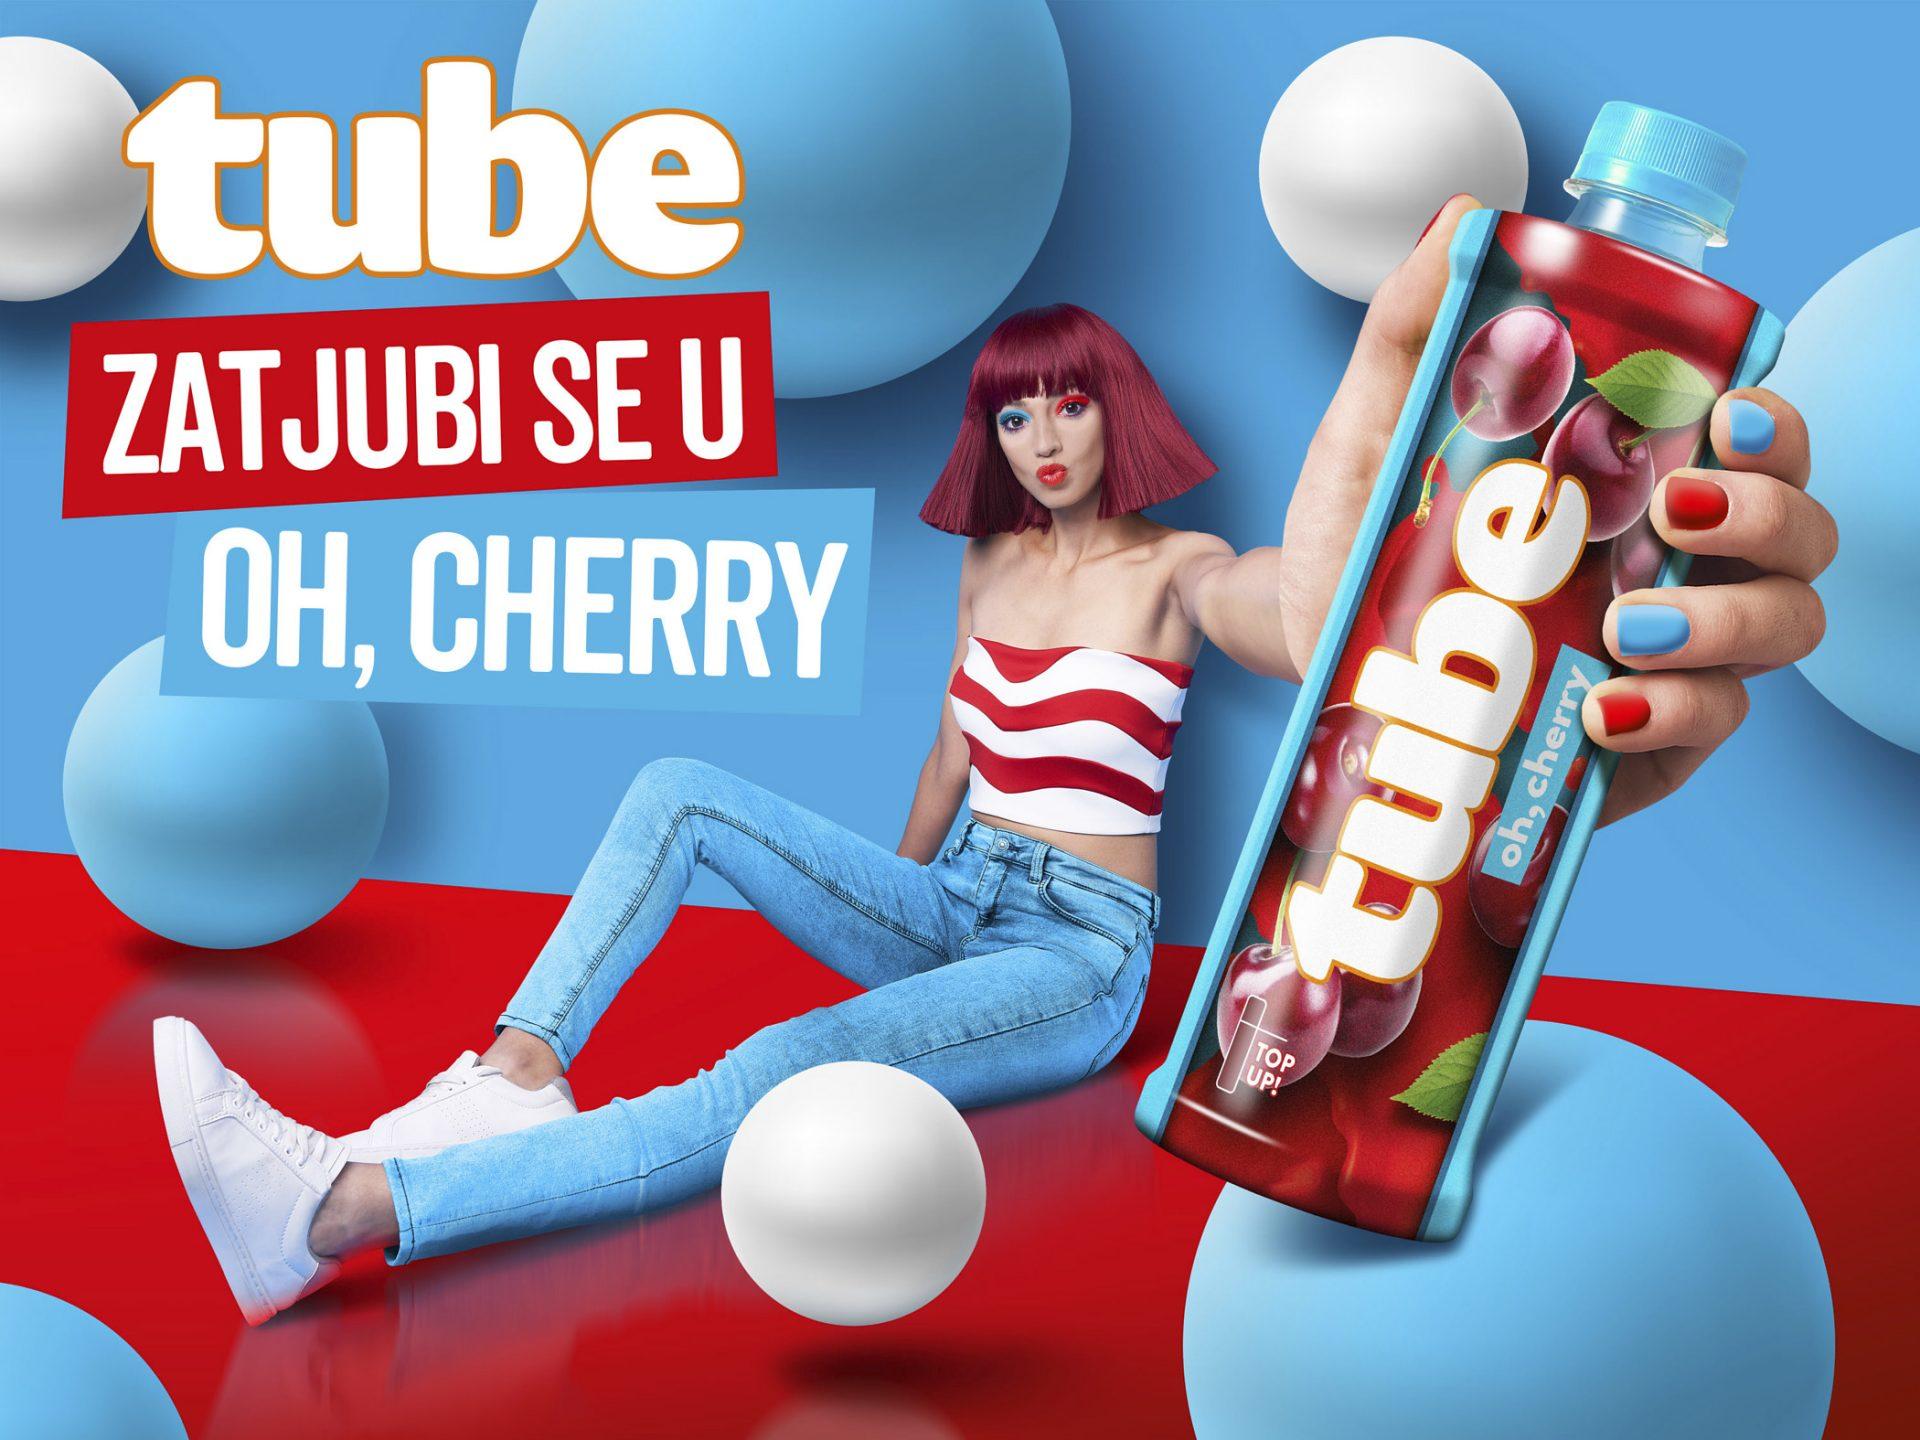 Billboard-Tube_Oh-Cherry-2_4x3